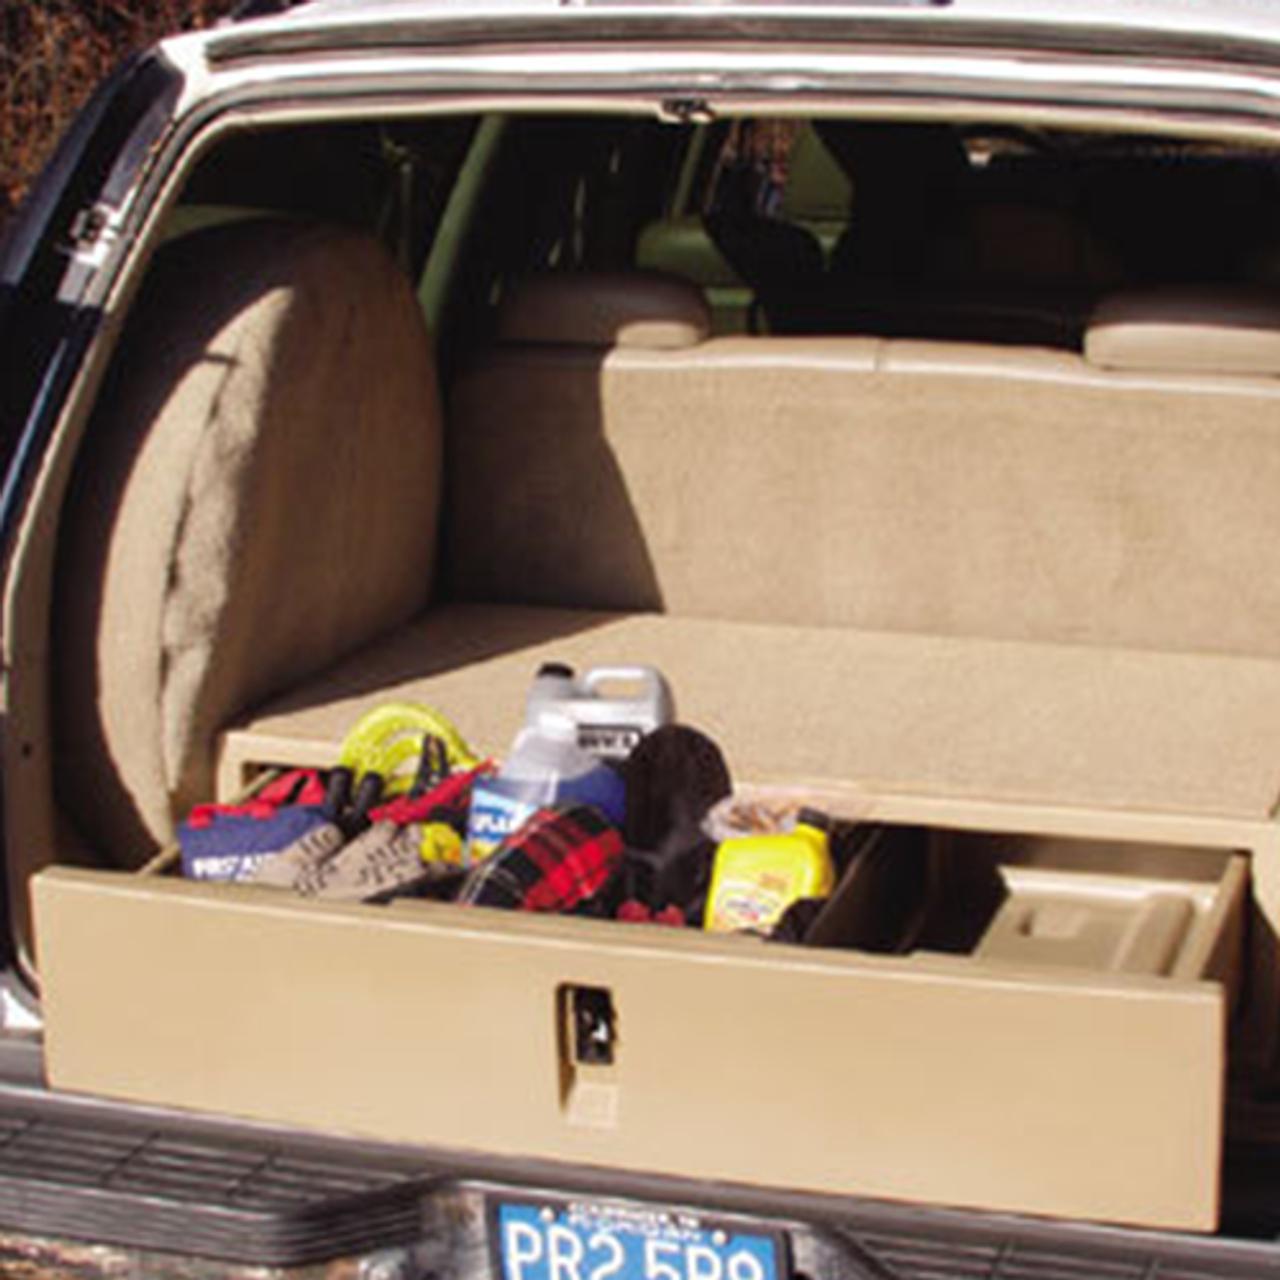 Suv Cargo Organizer >> Suv Rear Cargo Caddy Storage System And Organizer By Epi Fleet Safety